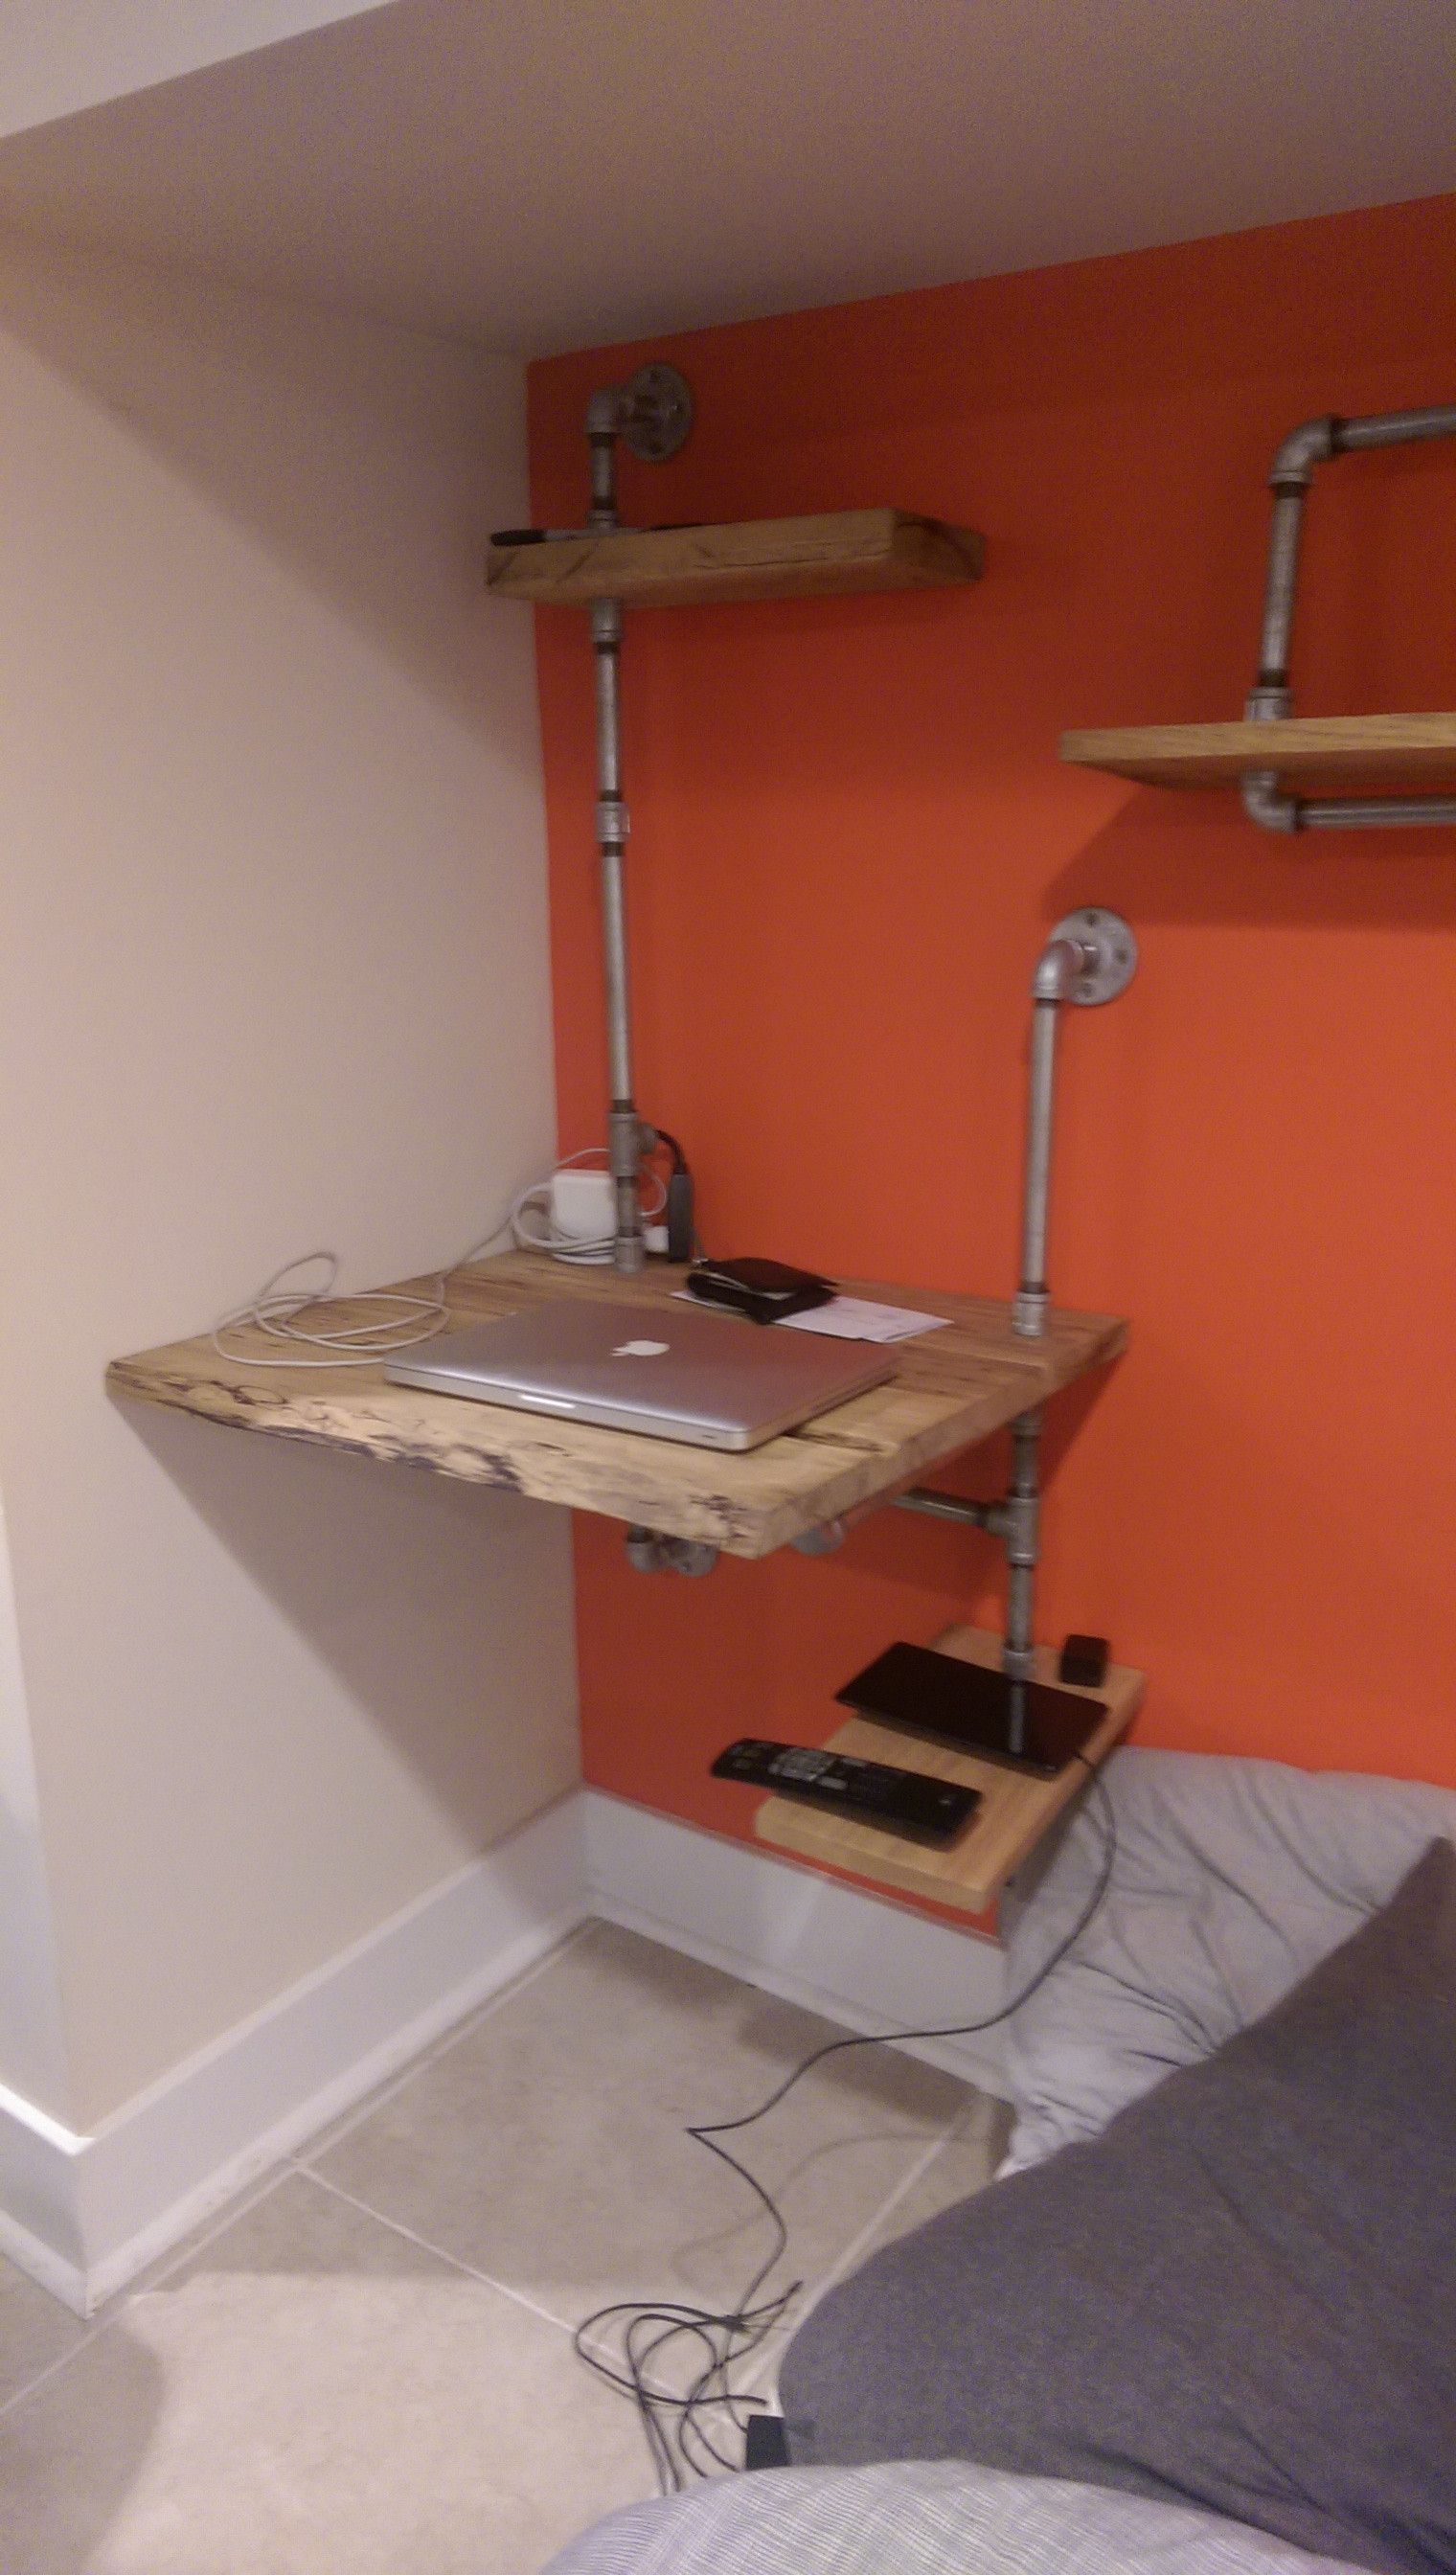 Diy Bedroom Furniture Using Reclaimed Wood And Plumbing Pipes